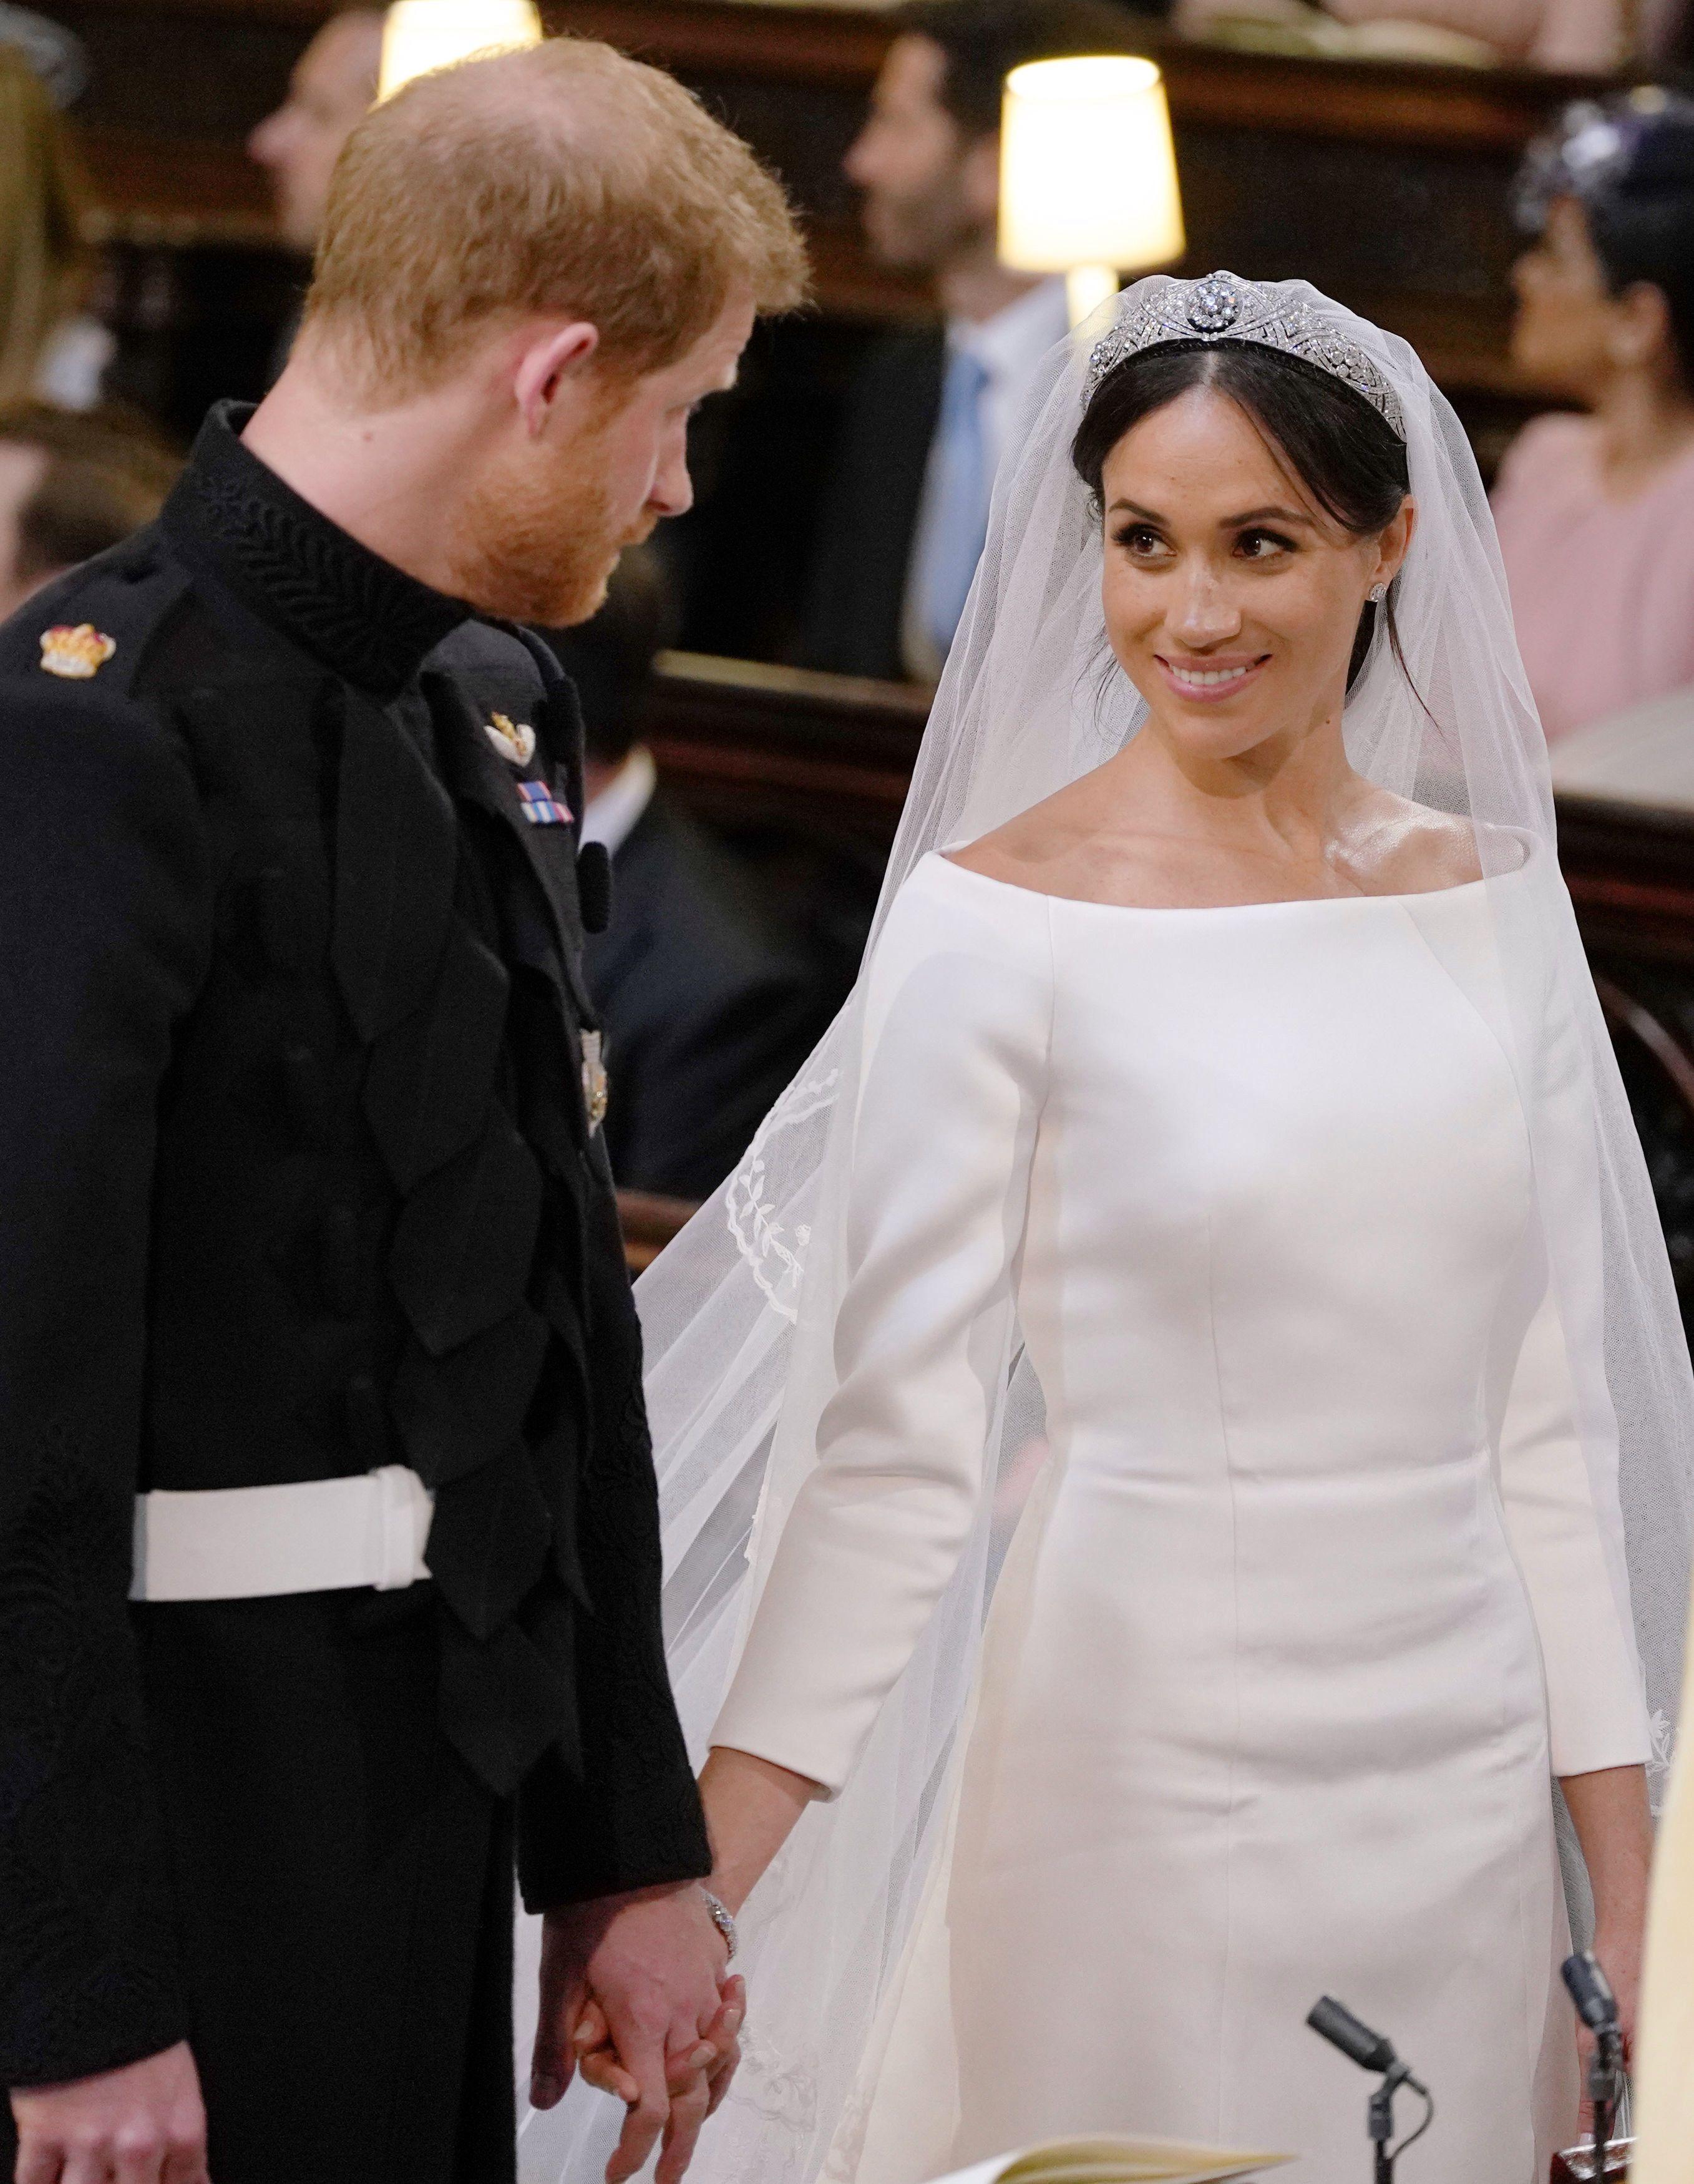 Royal Wedding Dress Meghan Markle.Meghan Markle S Royal Wedding Dress Is A Nod To American Royalty